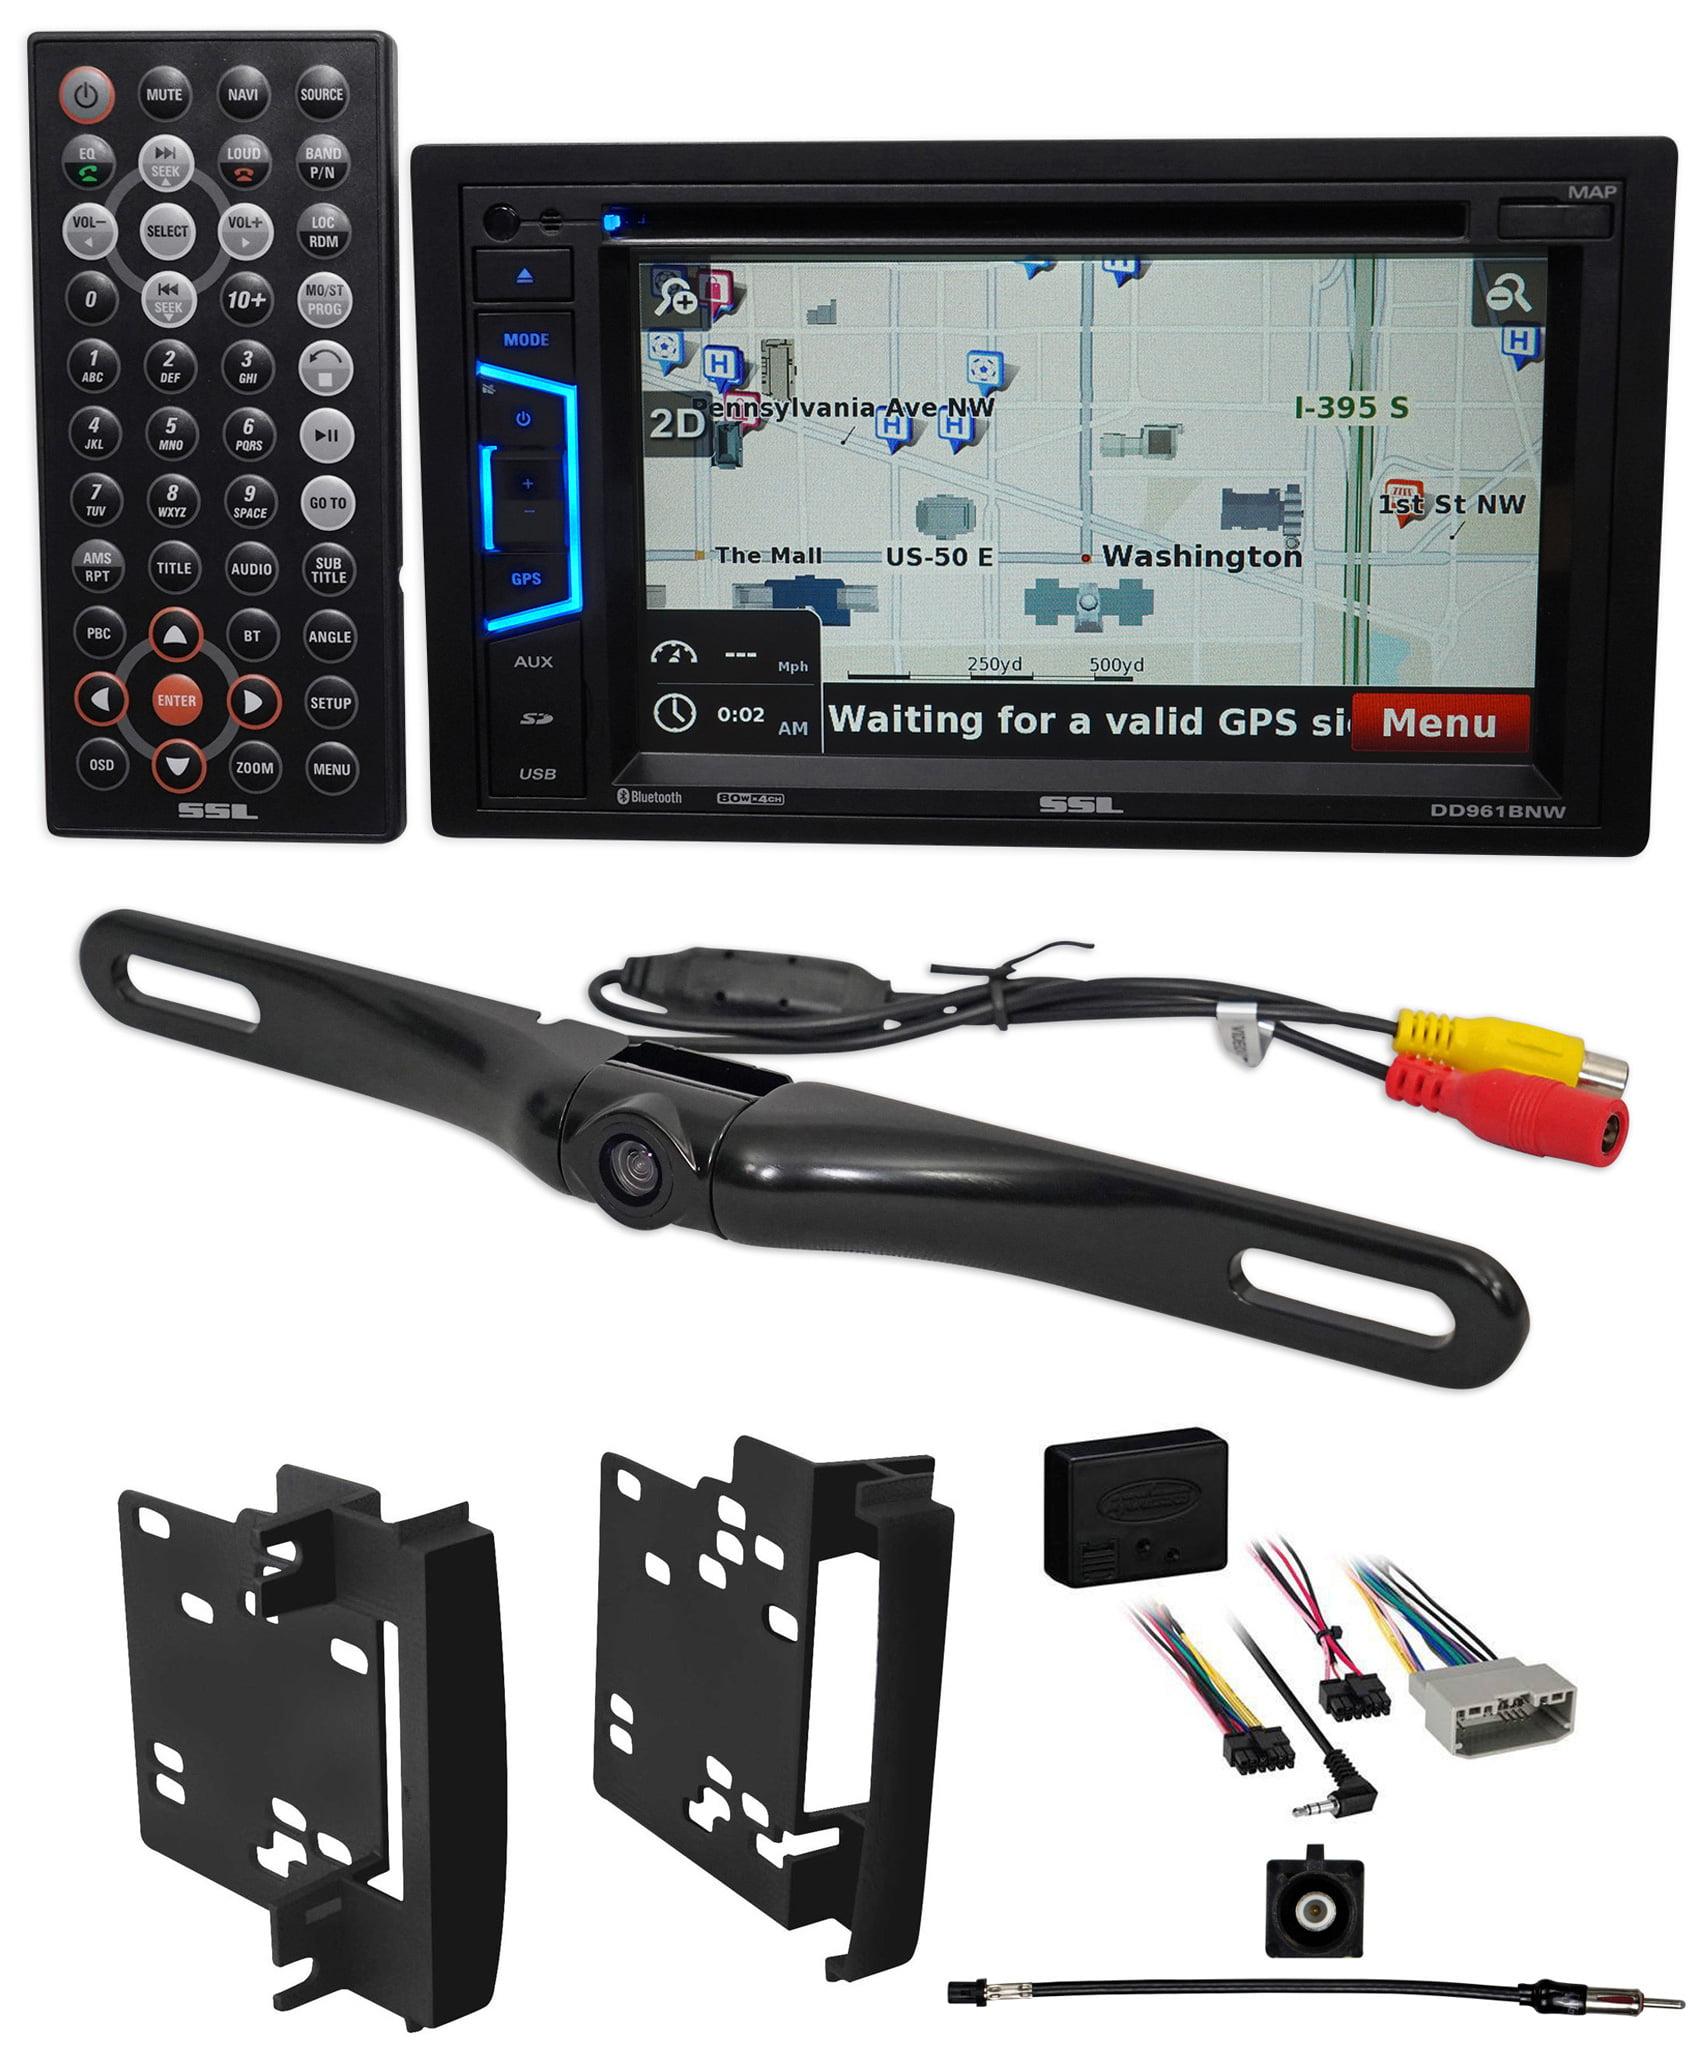 2008-2010 Jeep Grand Cherokee Car Navigation DVD USB Receiver Bluetooth+Camera by SOUND STORM